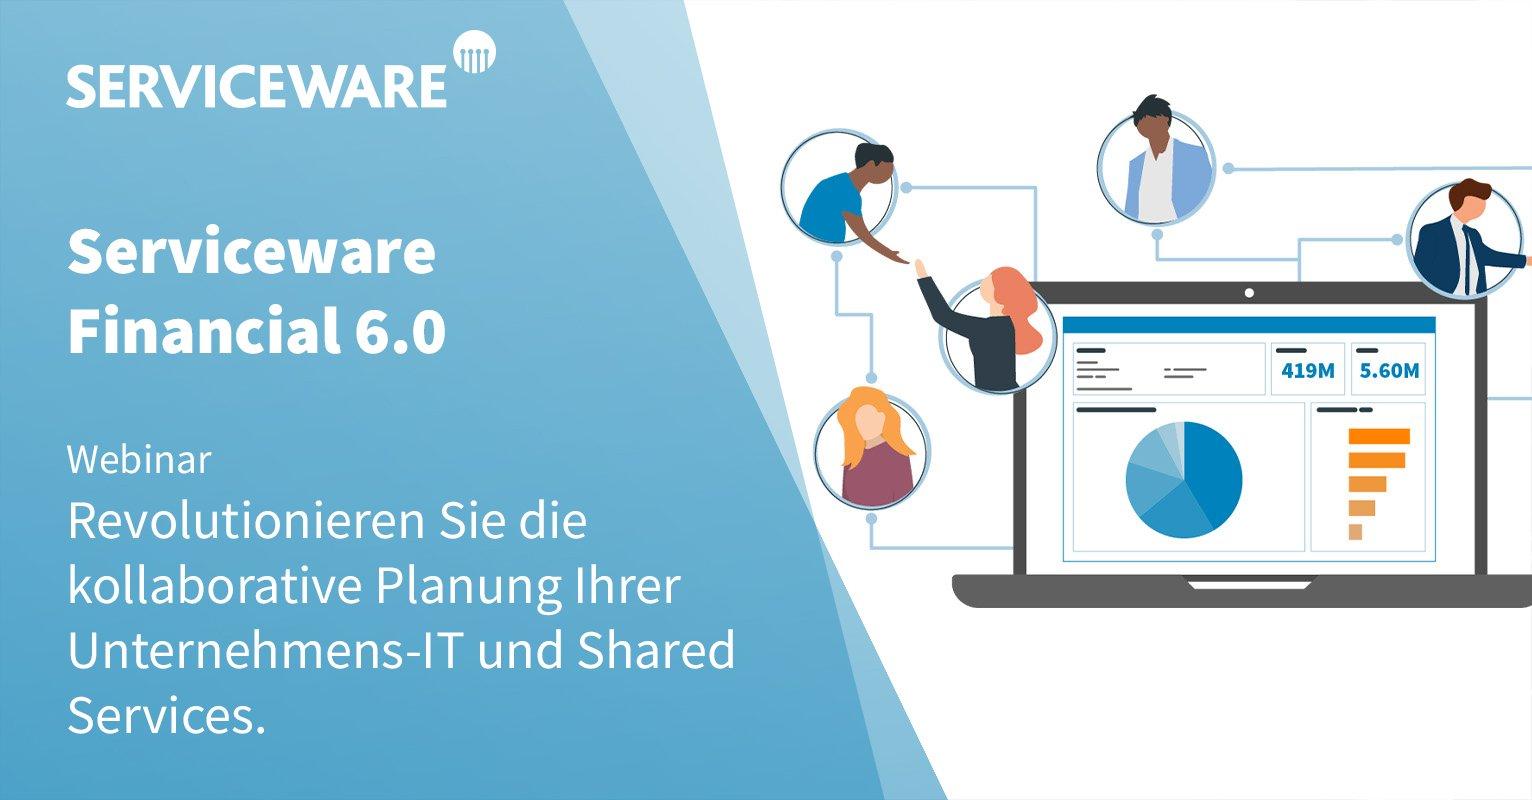 Serviceware Webinar: Financial 6.0